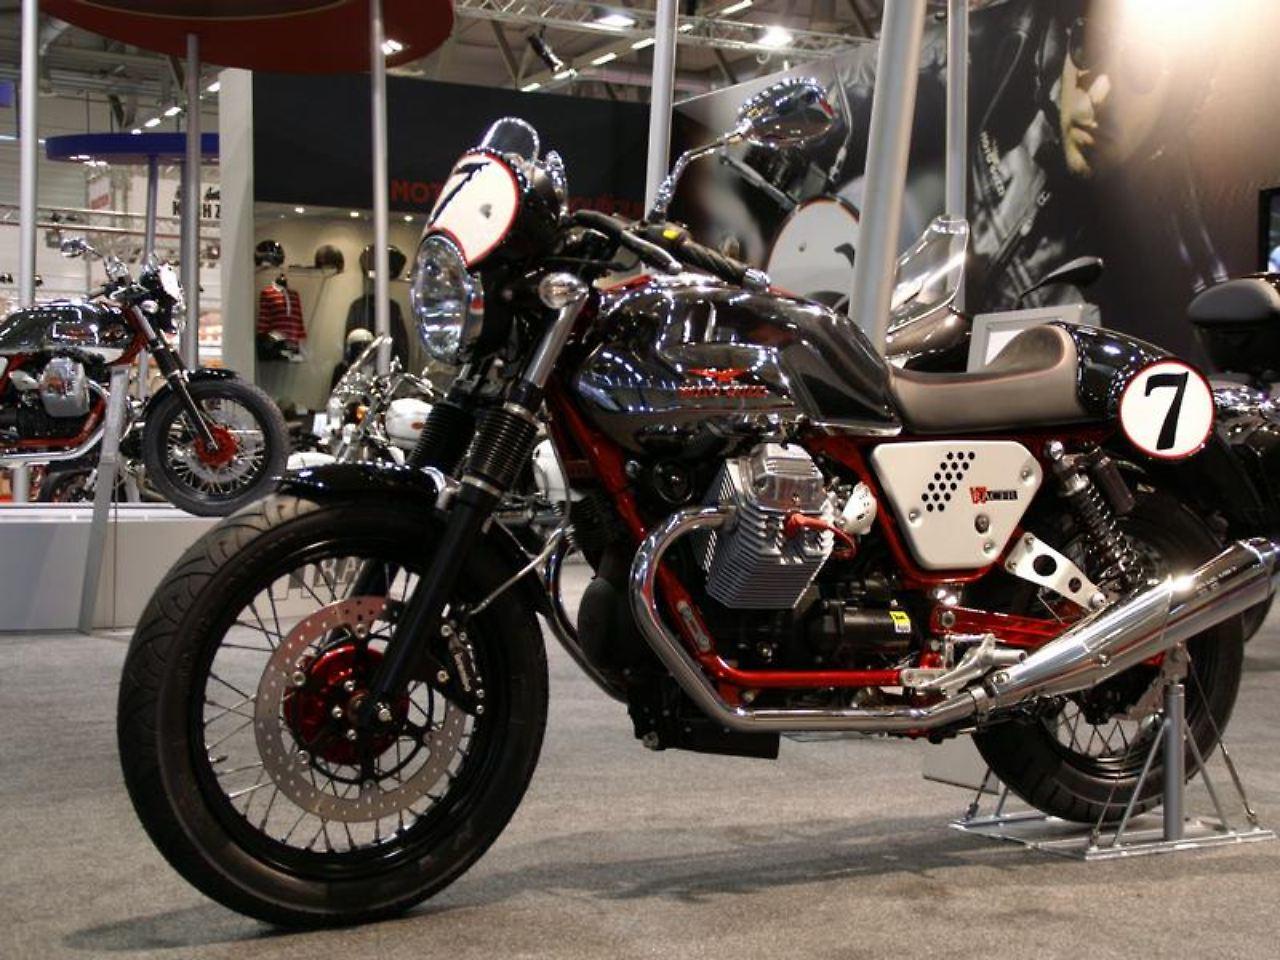 Moto Guzzi V7 Racer: Comeback der Siebziger - n-tv.de